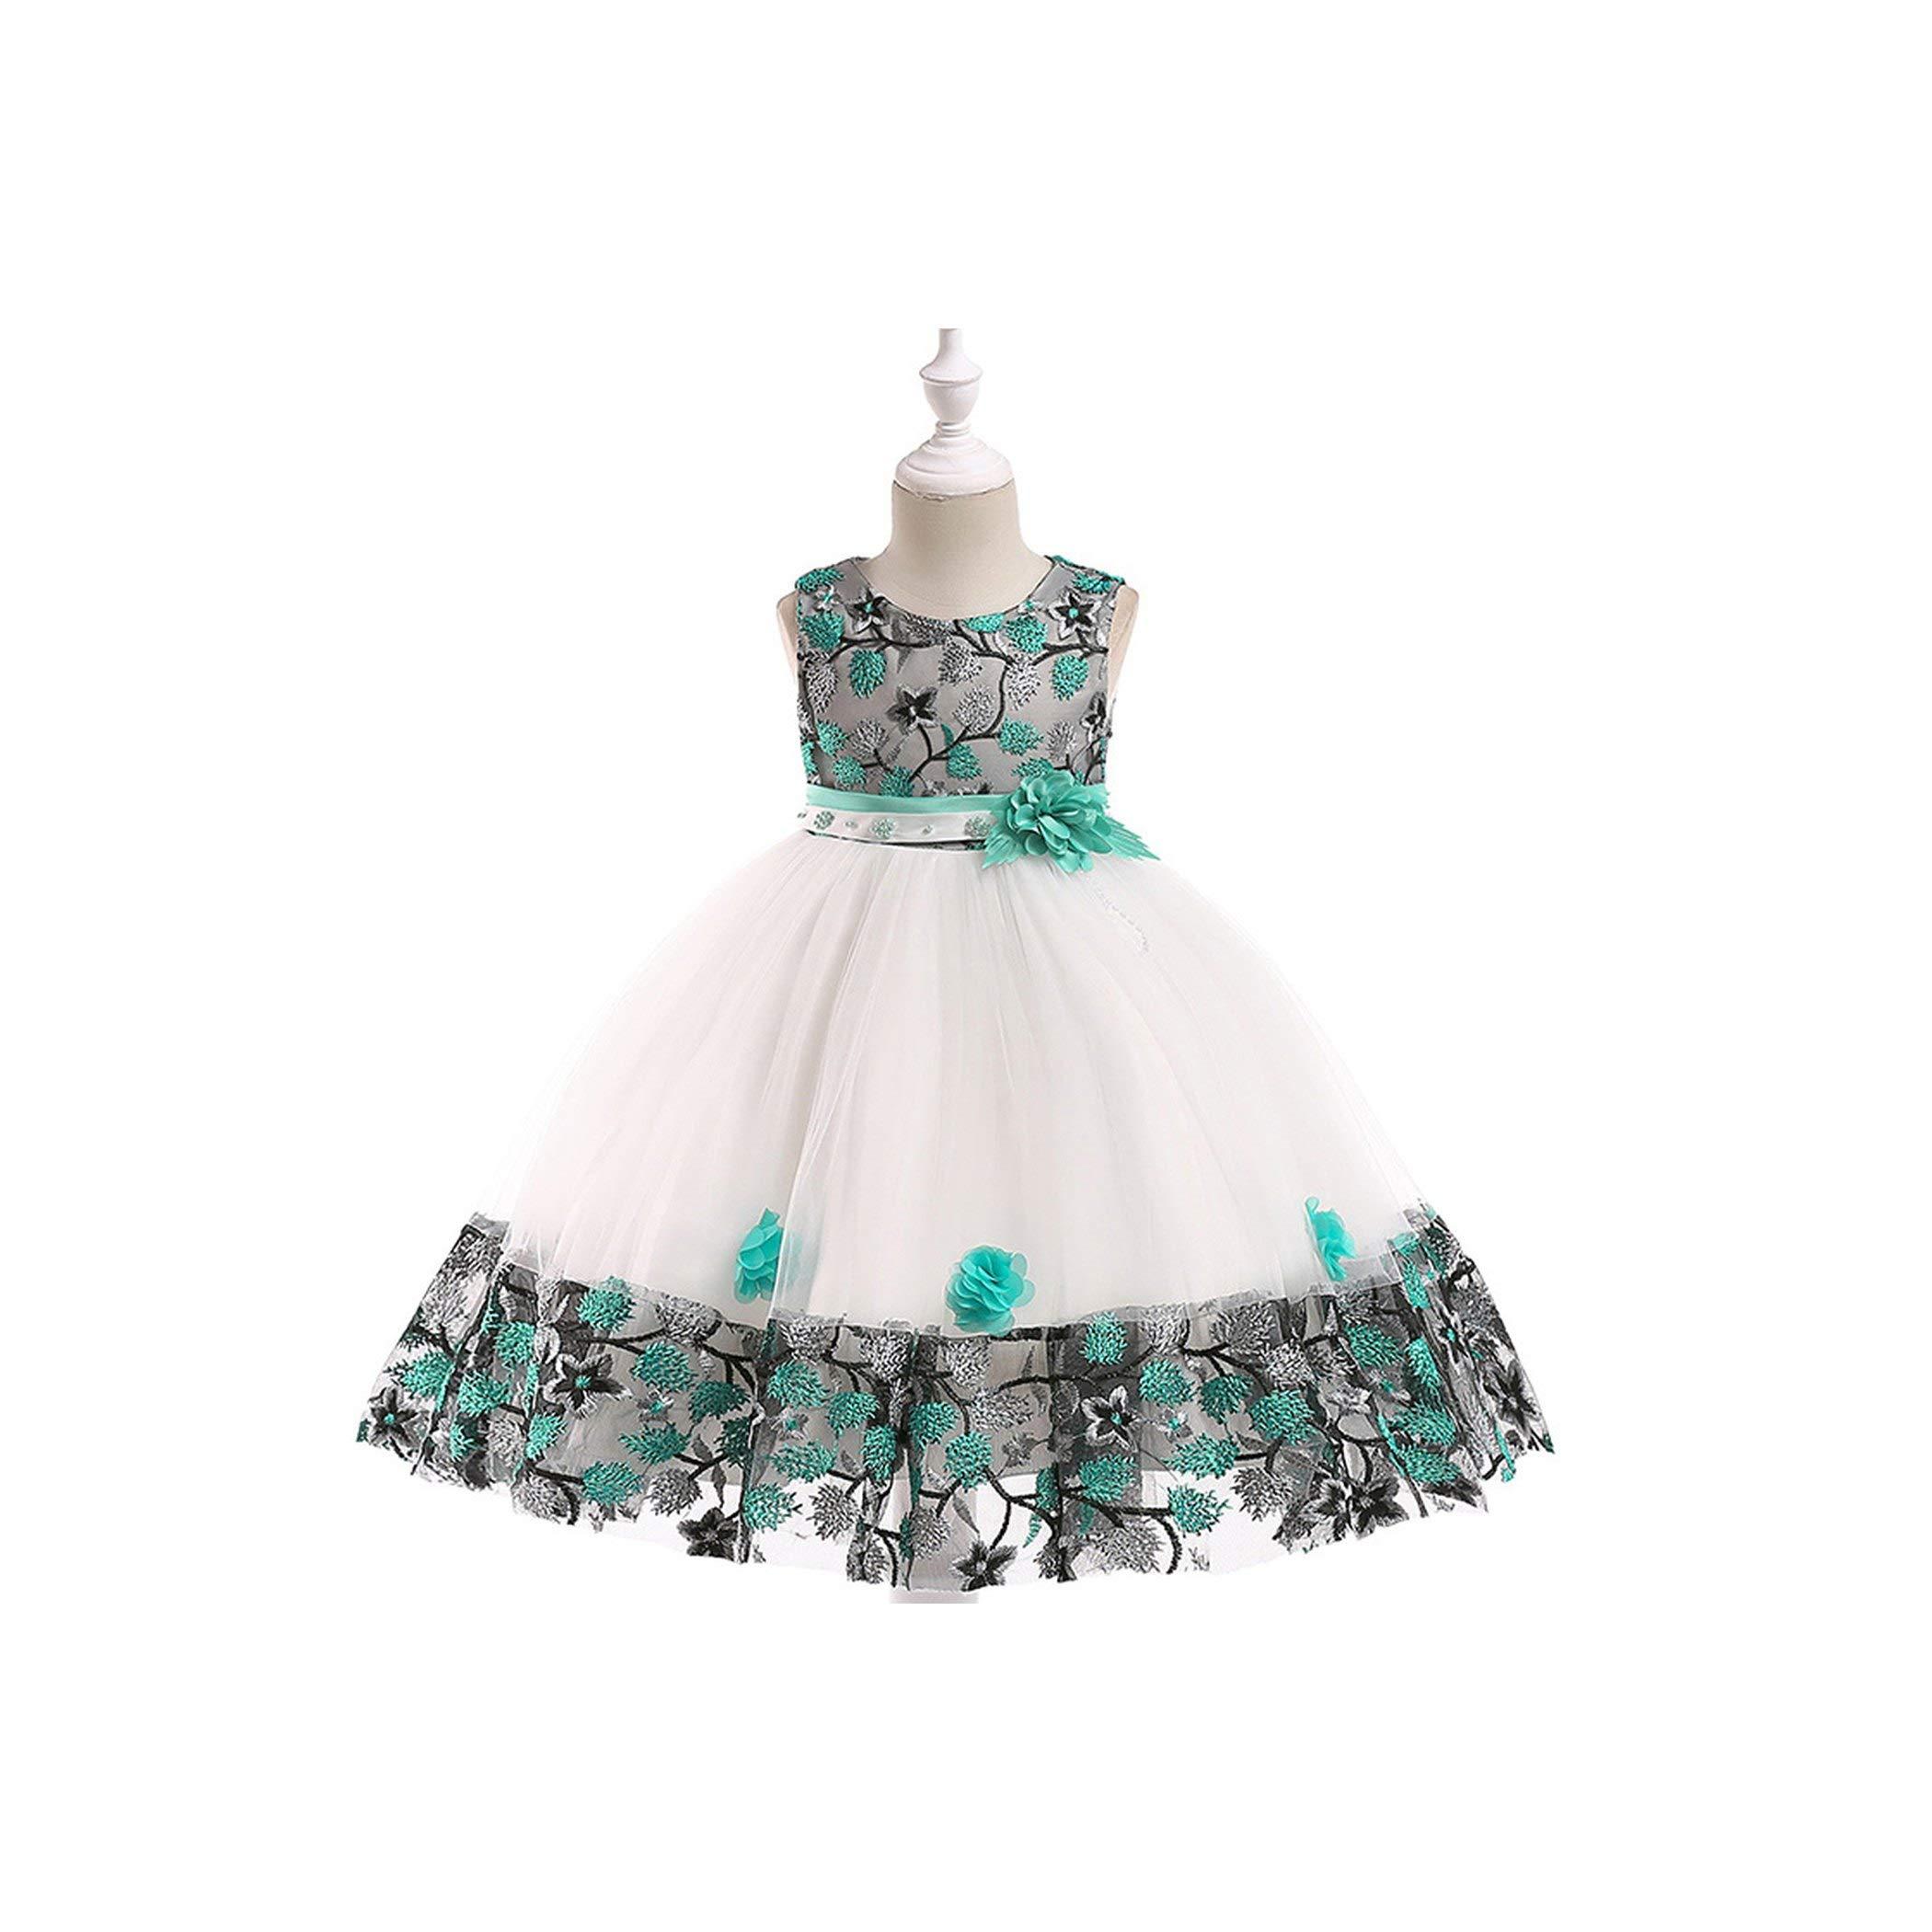 3-8T Flower Girls Dress Princess Lace Design Party Dress Birthday Costume Children Girl Dress,Green,ZT